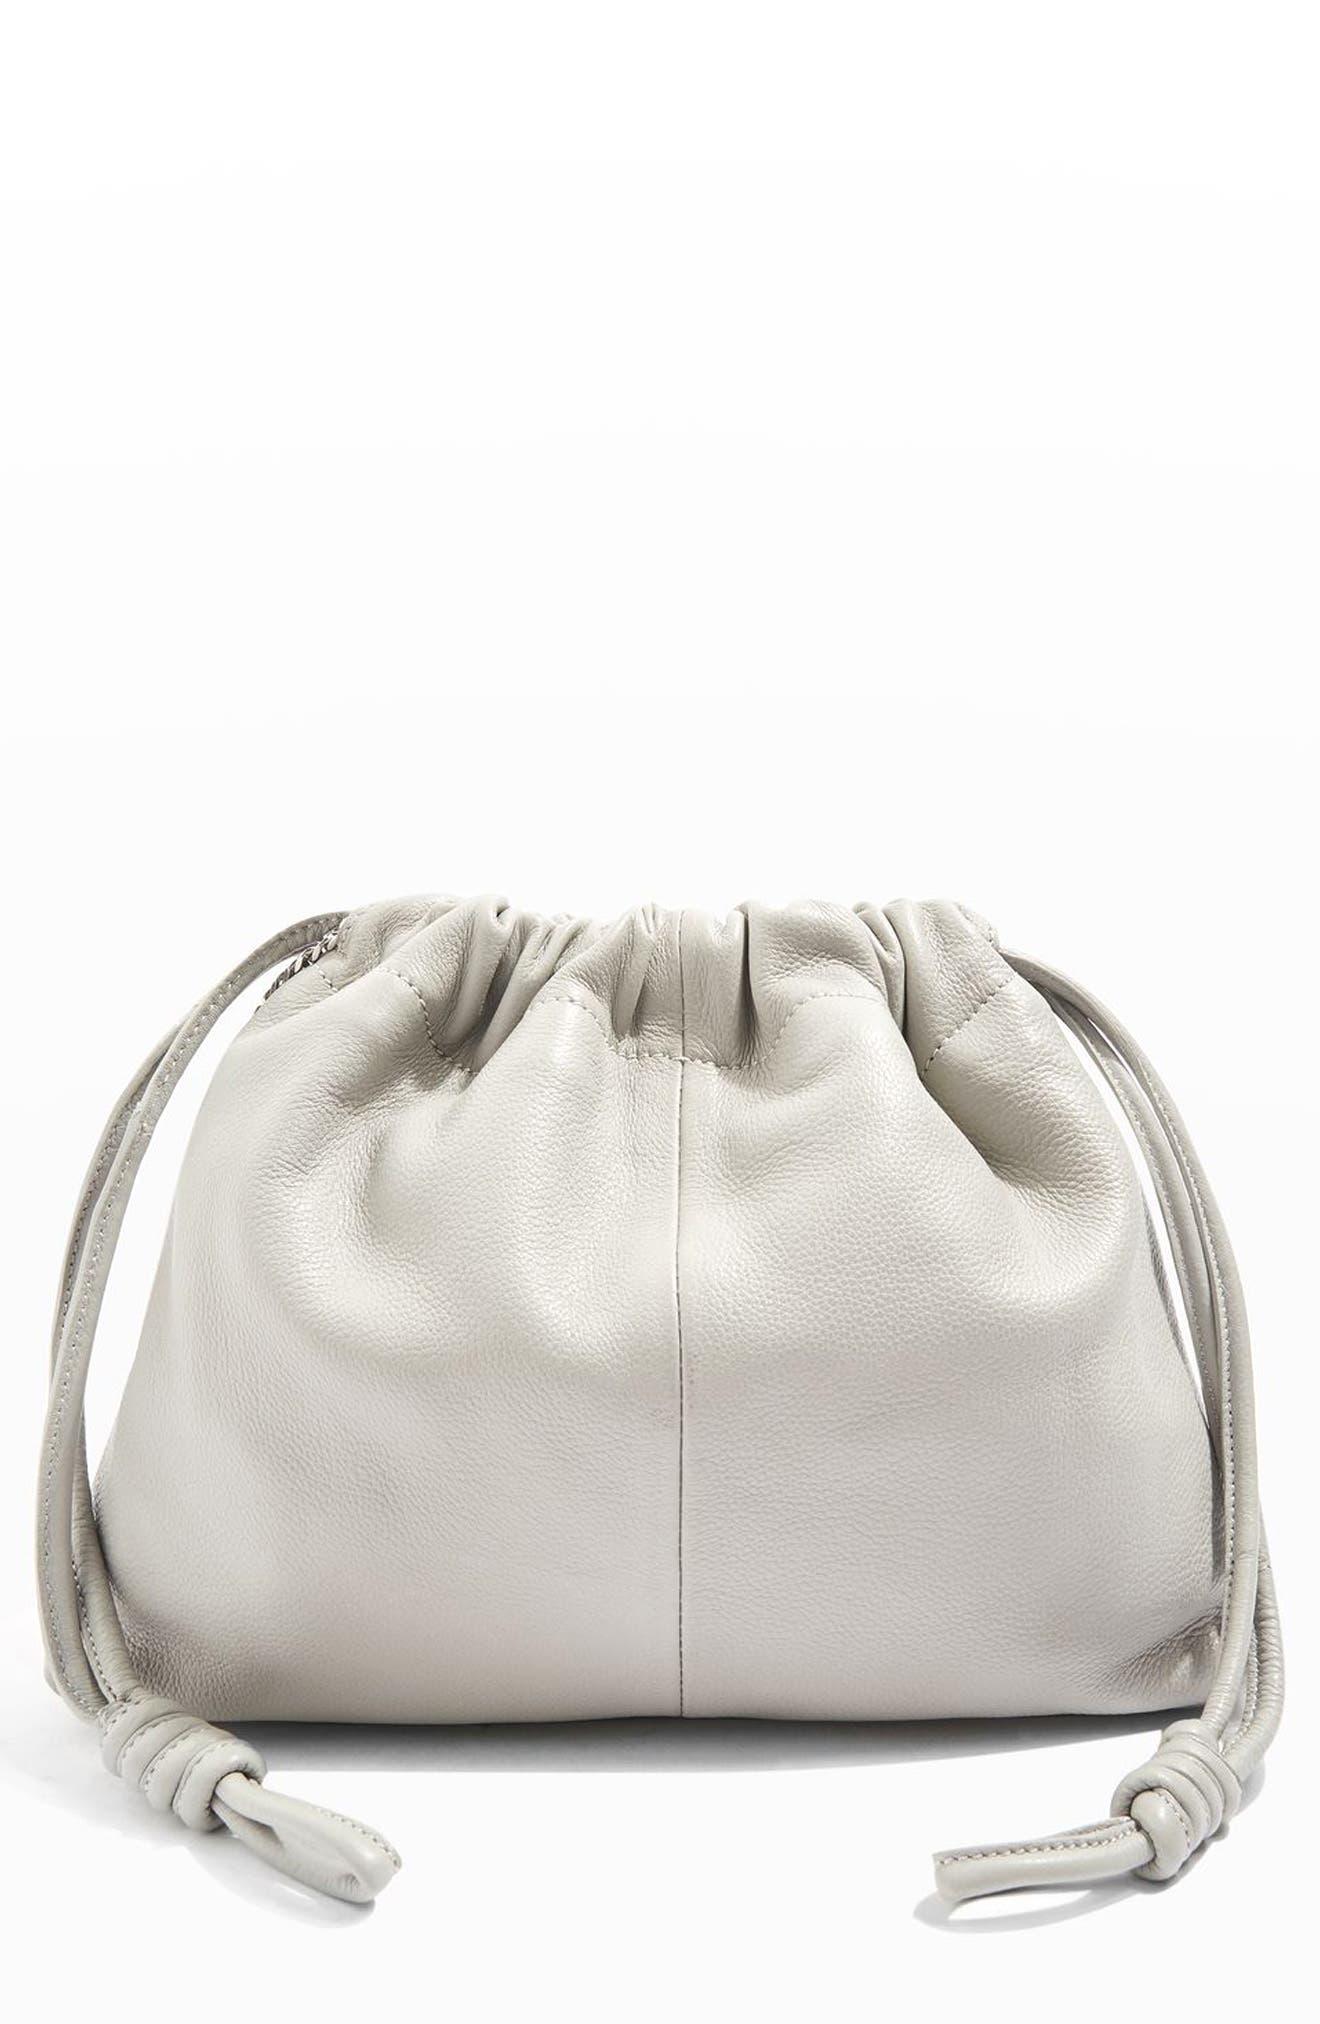 Alternate Image 1 Selected - Topshop Premium Leather Drawstring Crossbody Bag